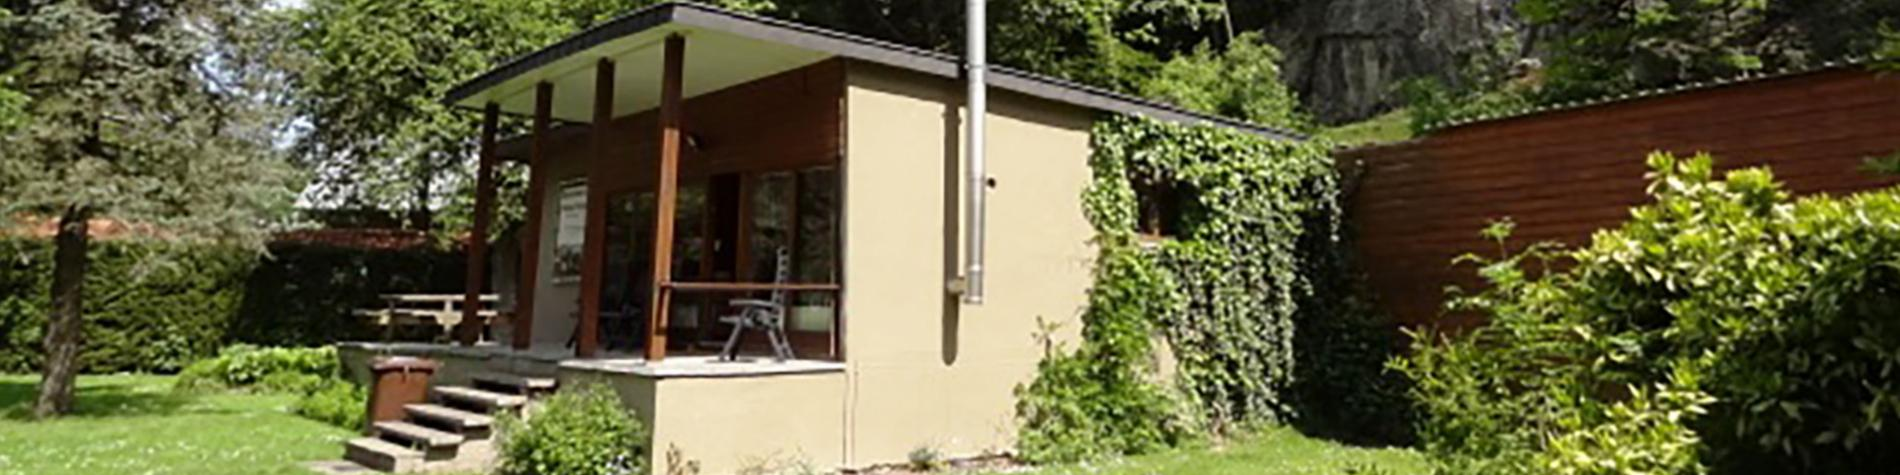 Gîte rural - Chalet - Oasis Verte - Hamoir